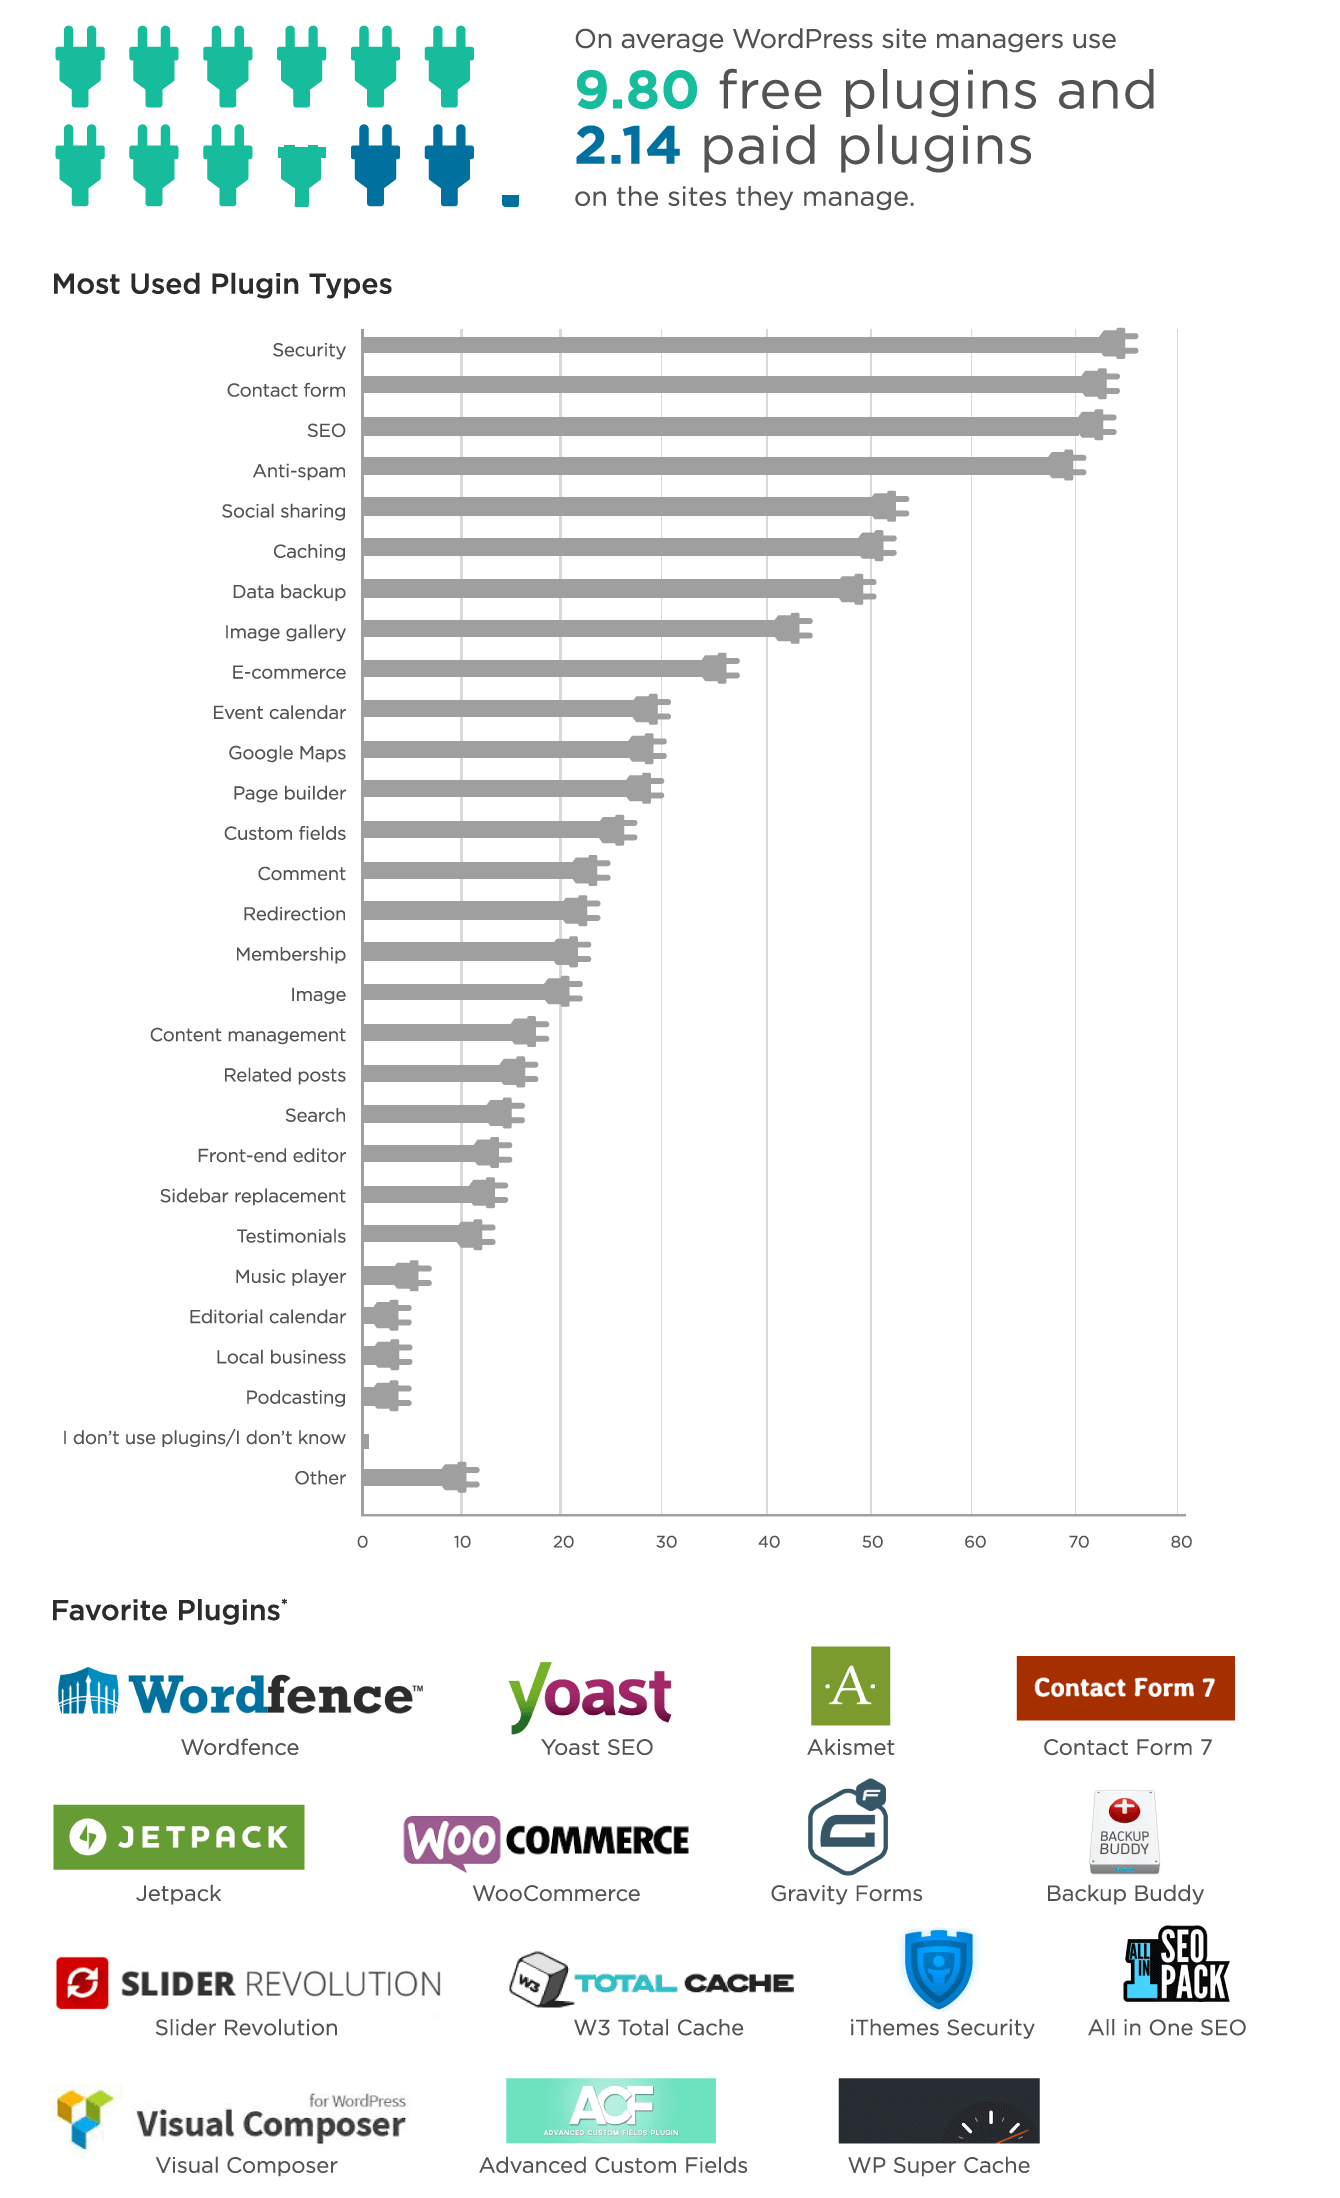 surveyreport_section3_crop